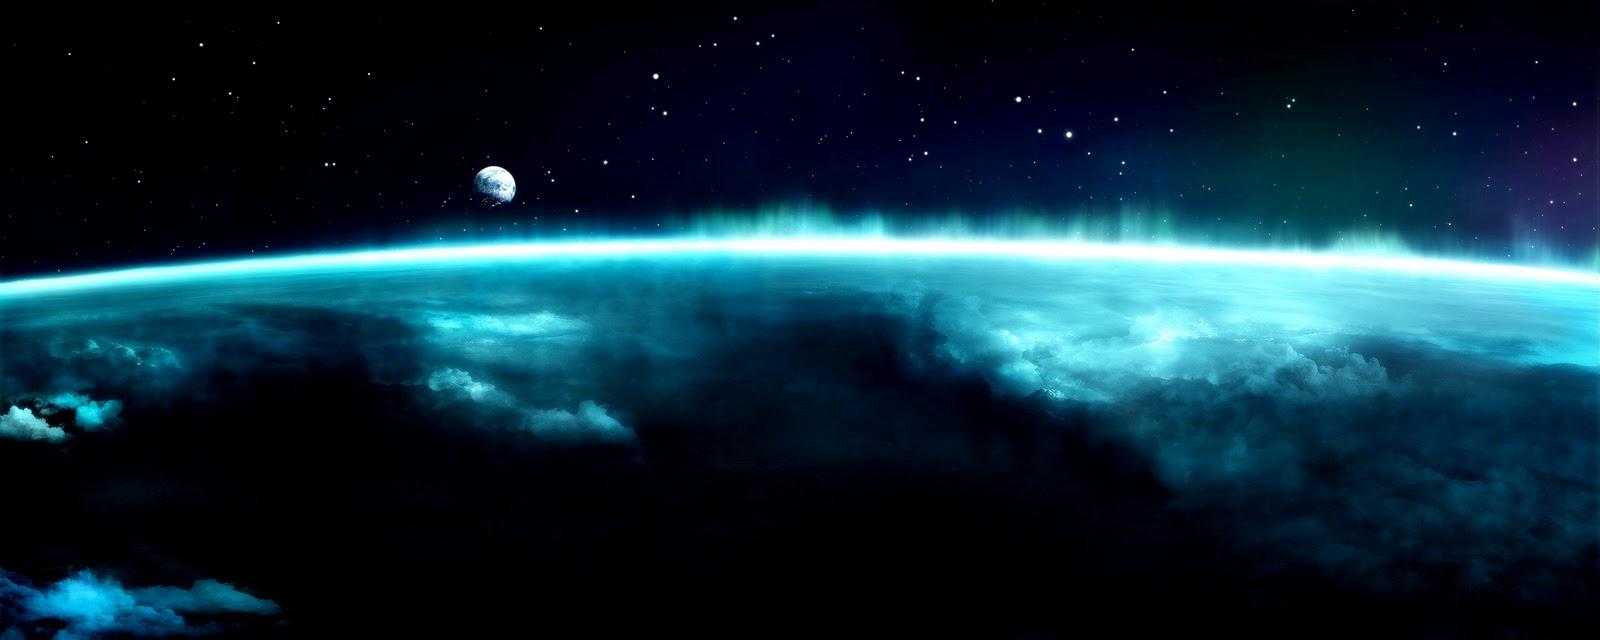 Screen monitor the earth northern lights blue glow beautiful wallpaper